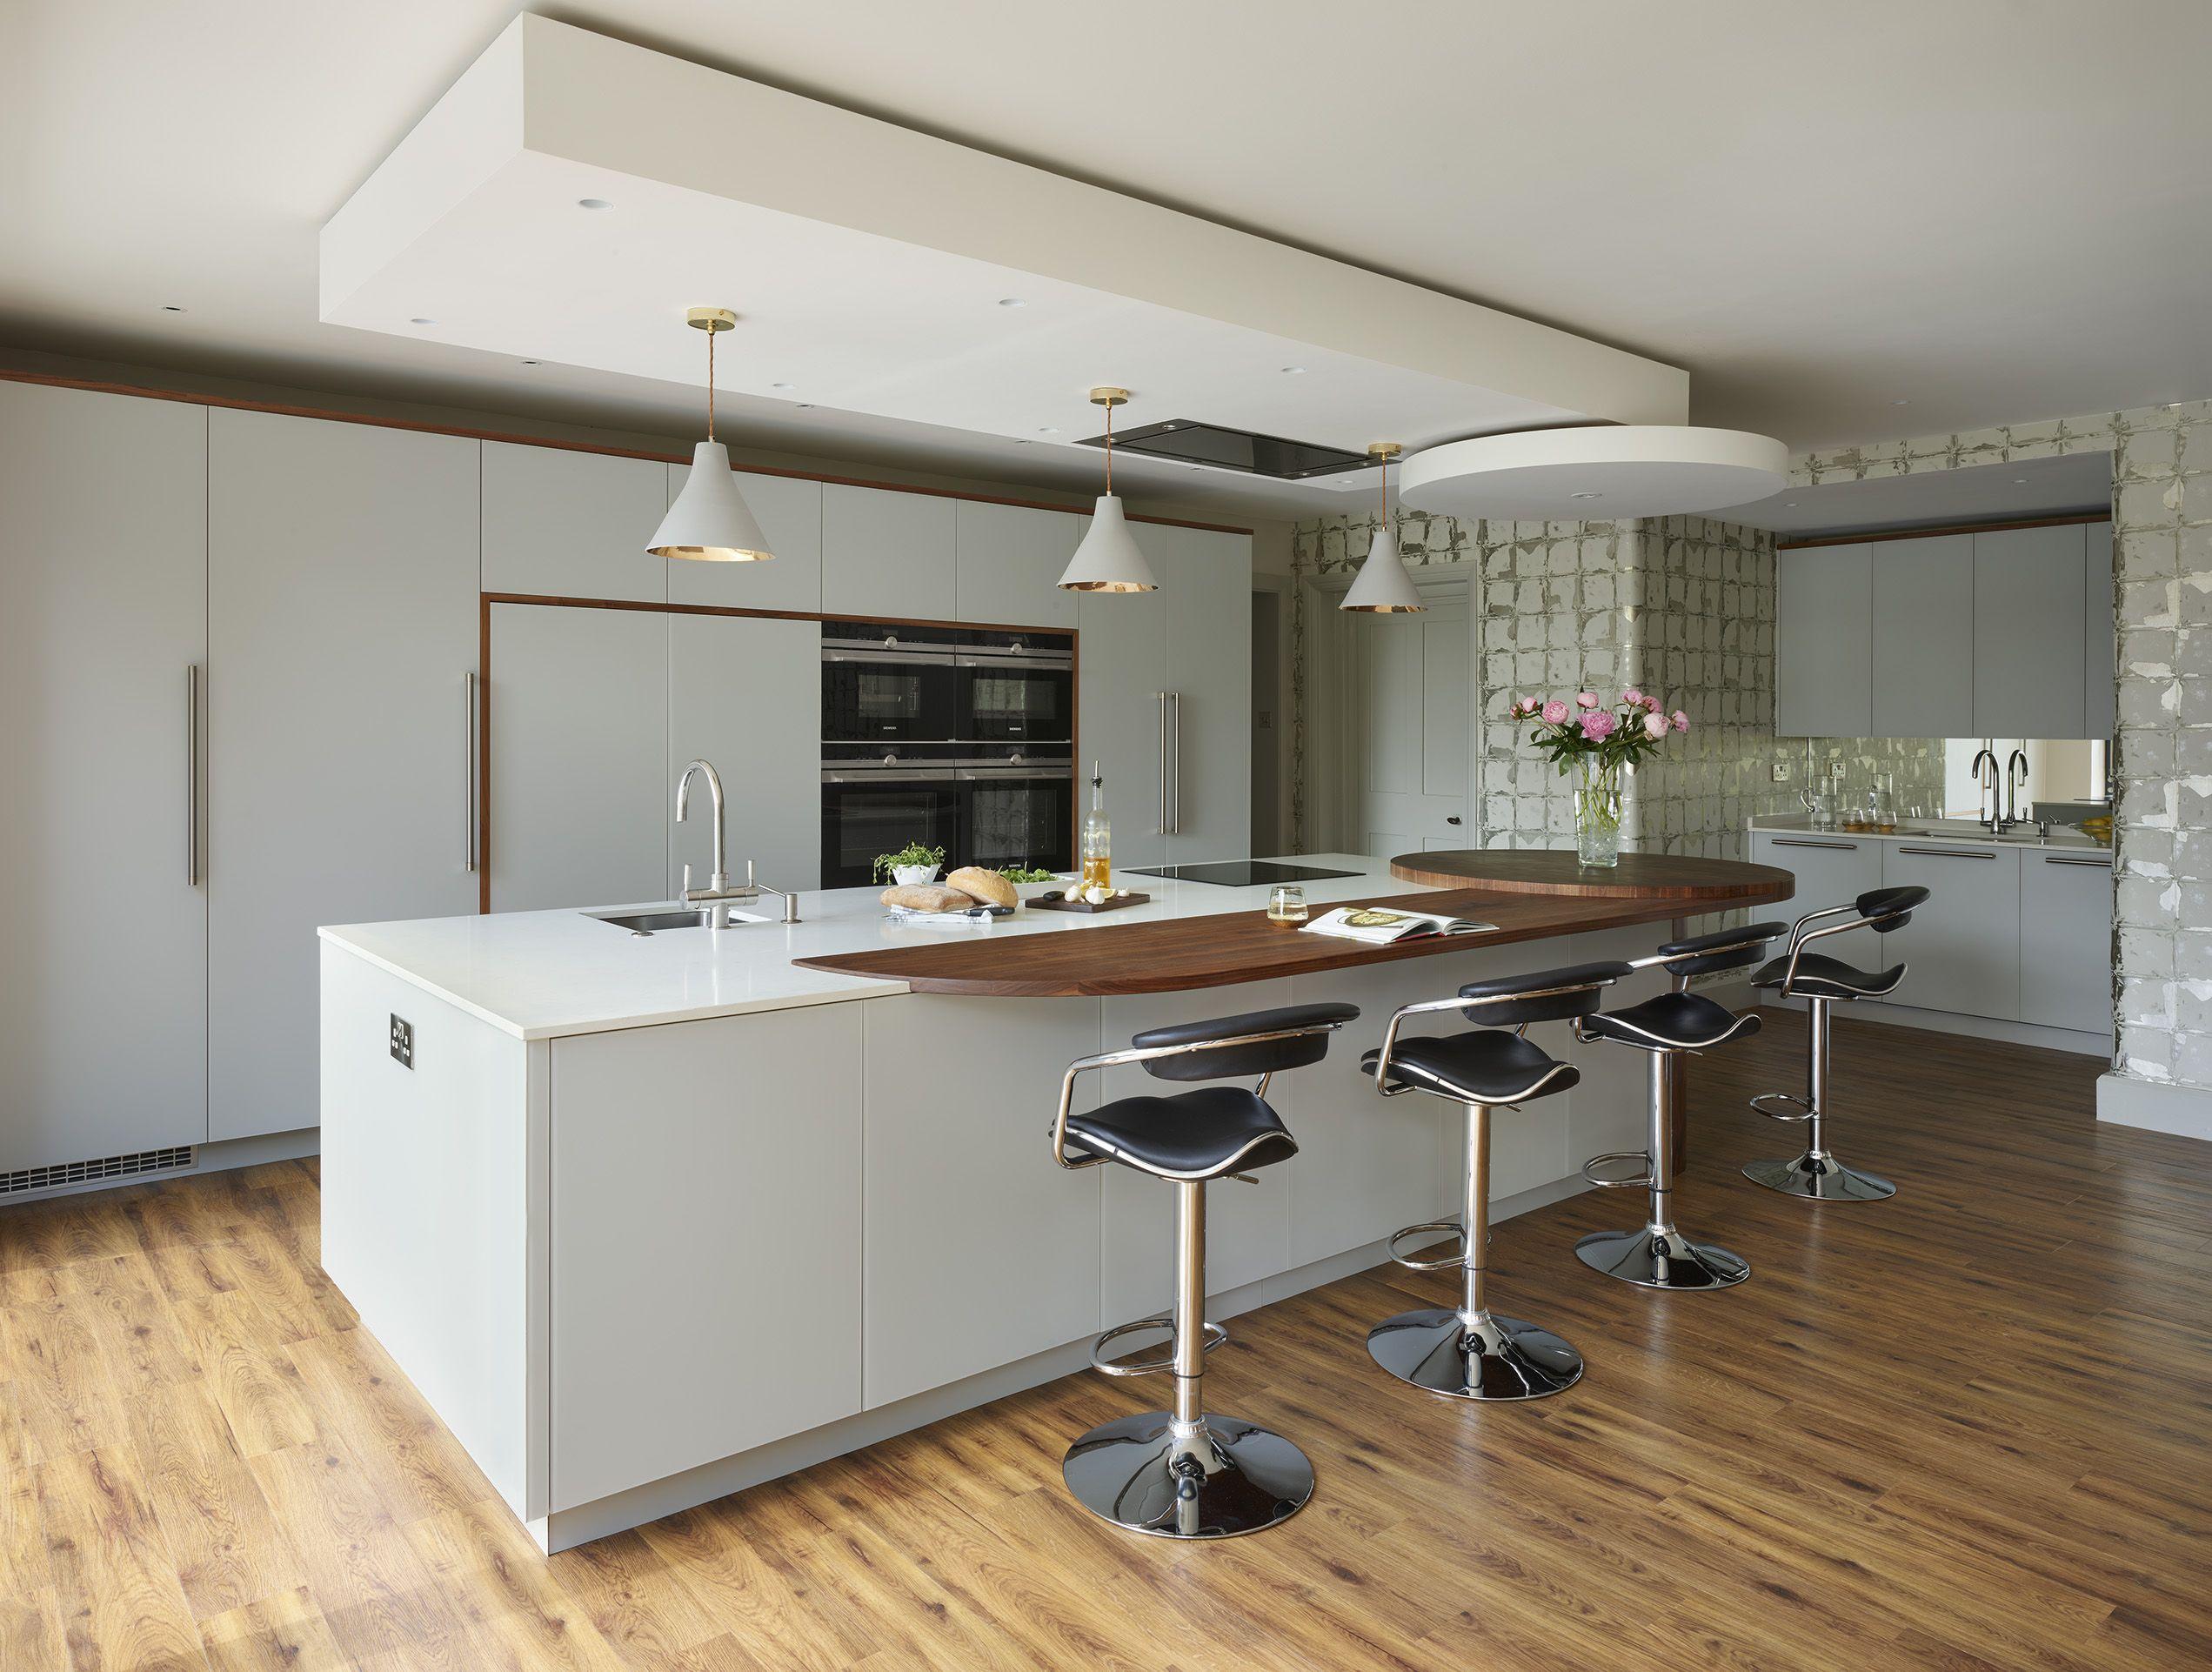 Soulbury Contemporary Kitchen  Simon Taylor Furniture  Kitchen Beauteous Contemporary Kitchen Chairs Inspiration Design